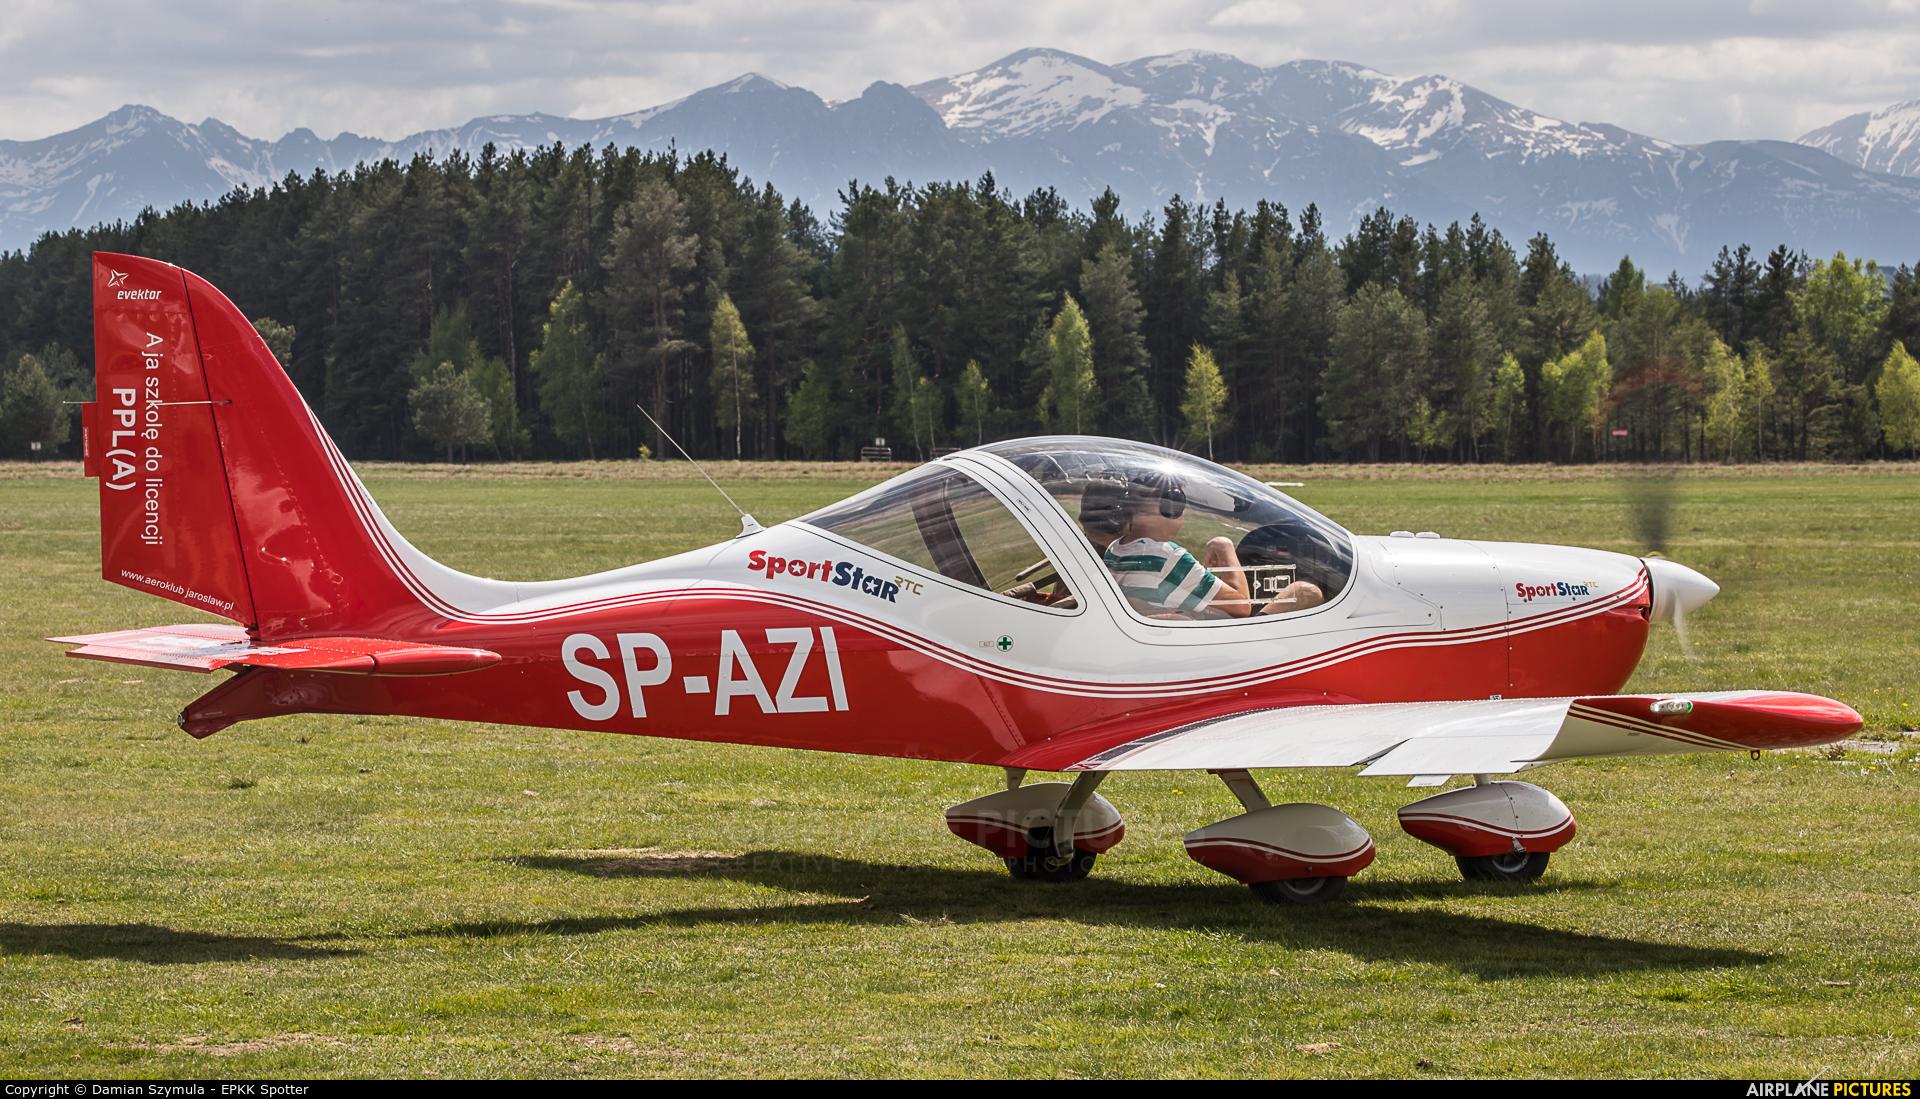 Aeroklub Ziemi Jarosławskiej SP-AZI aircraft at Nowy Targ Airport